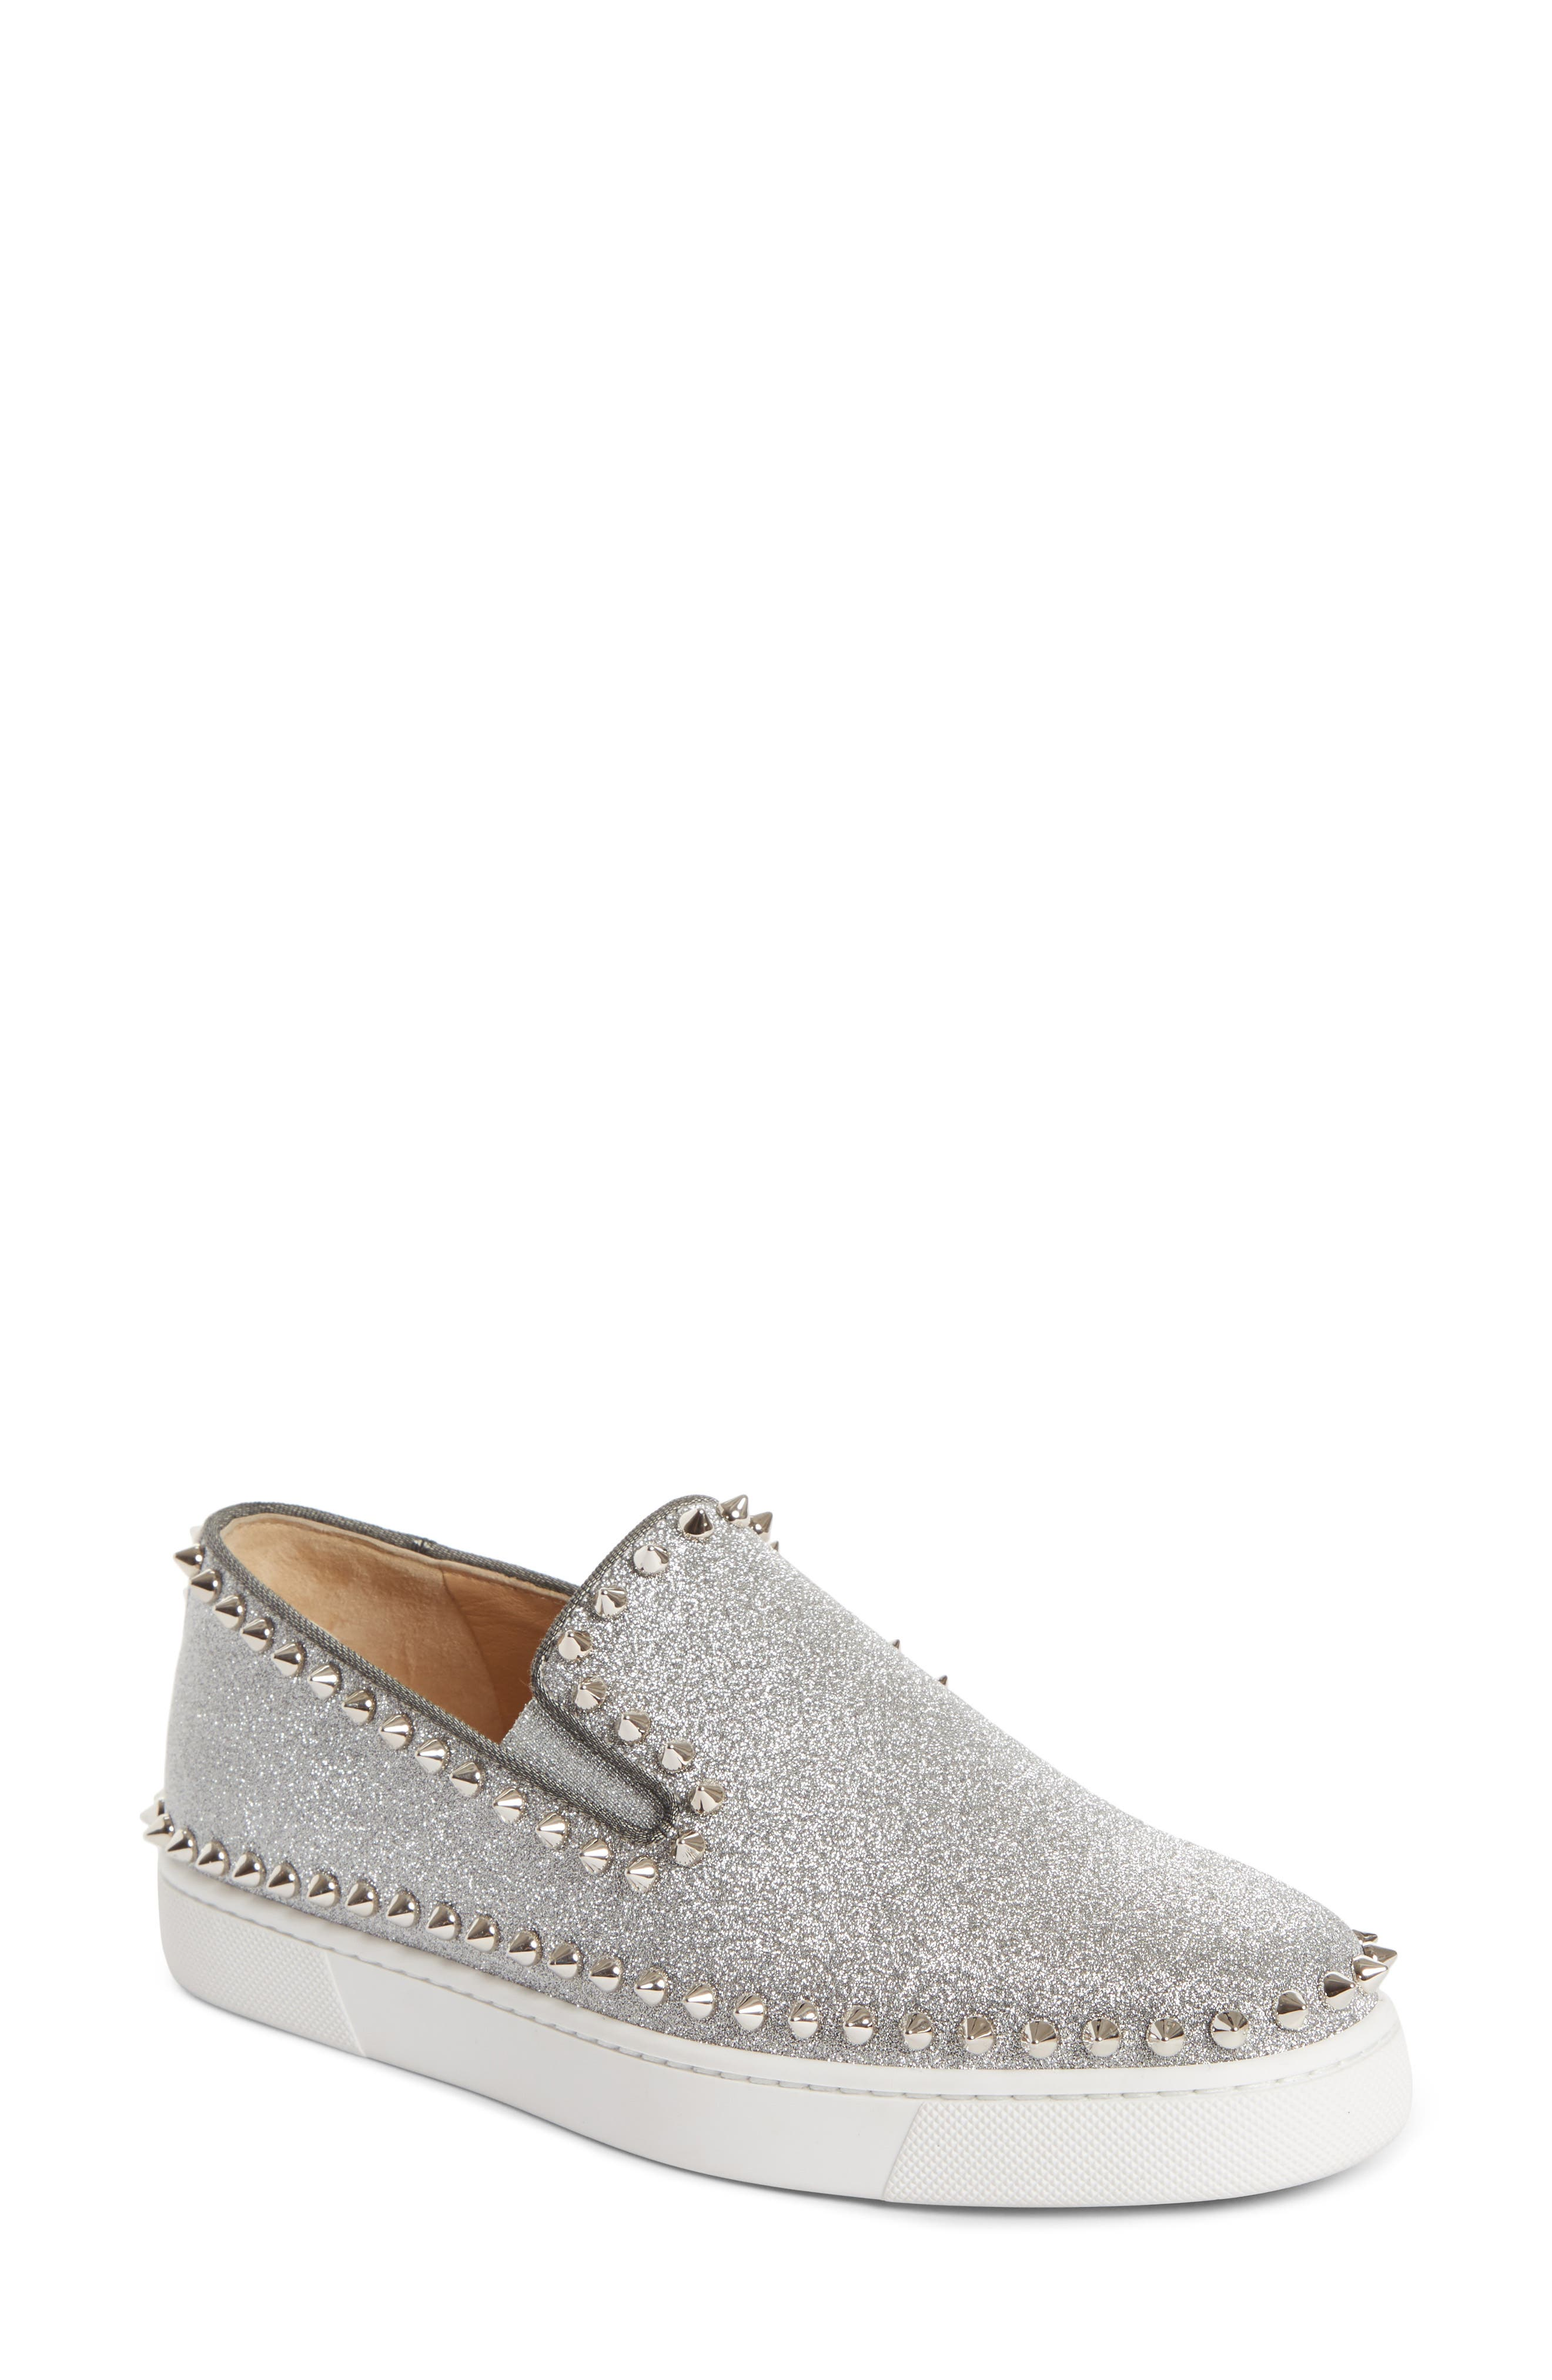 Christian Louboutin Spike Slip-On Sneaker (Women)